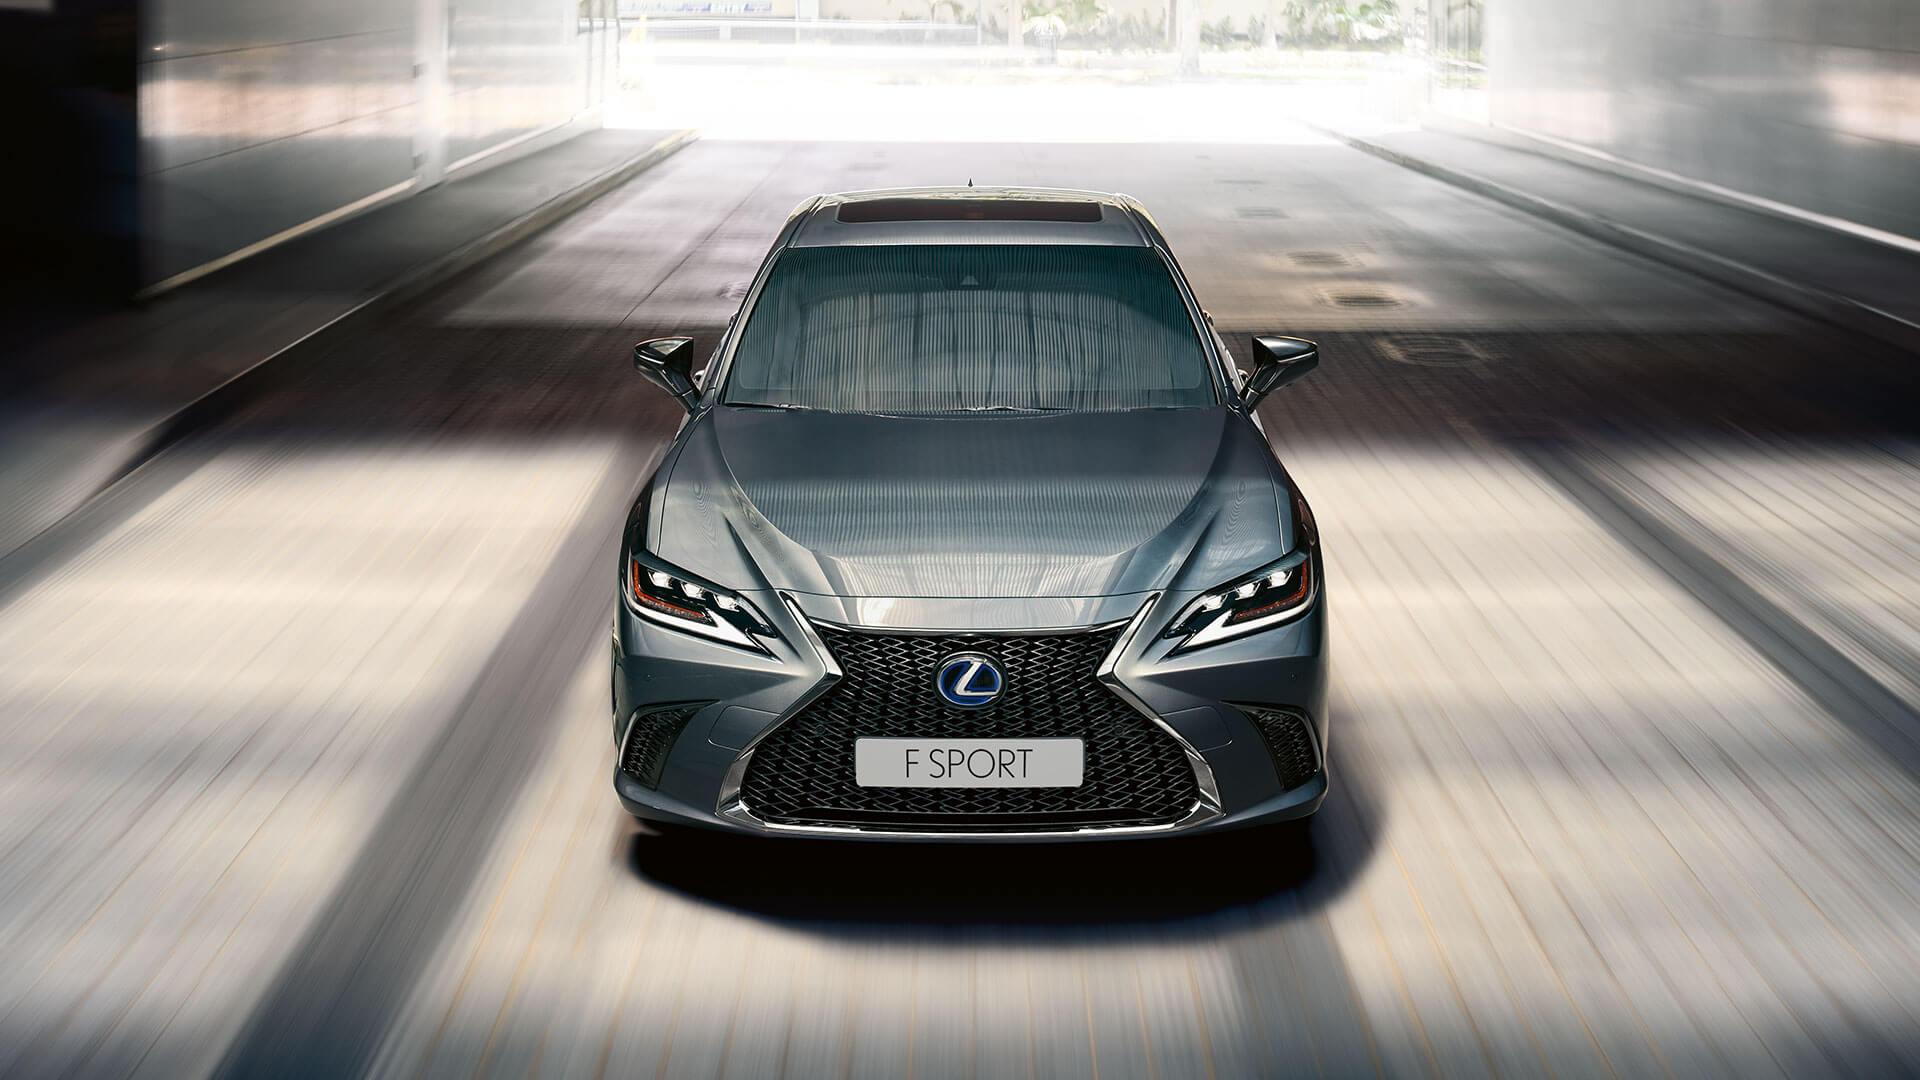 2019 lexus es hybrid experience feature 4th generation hybrid drive